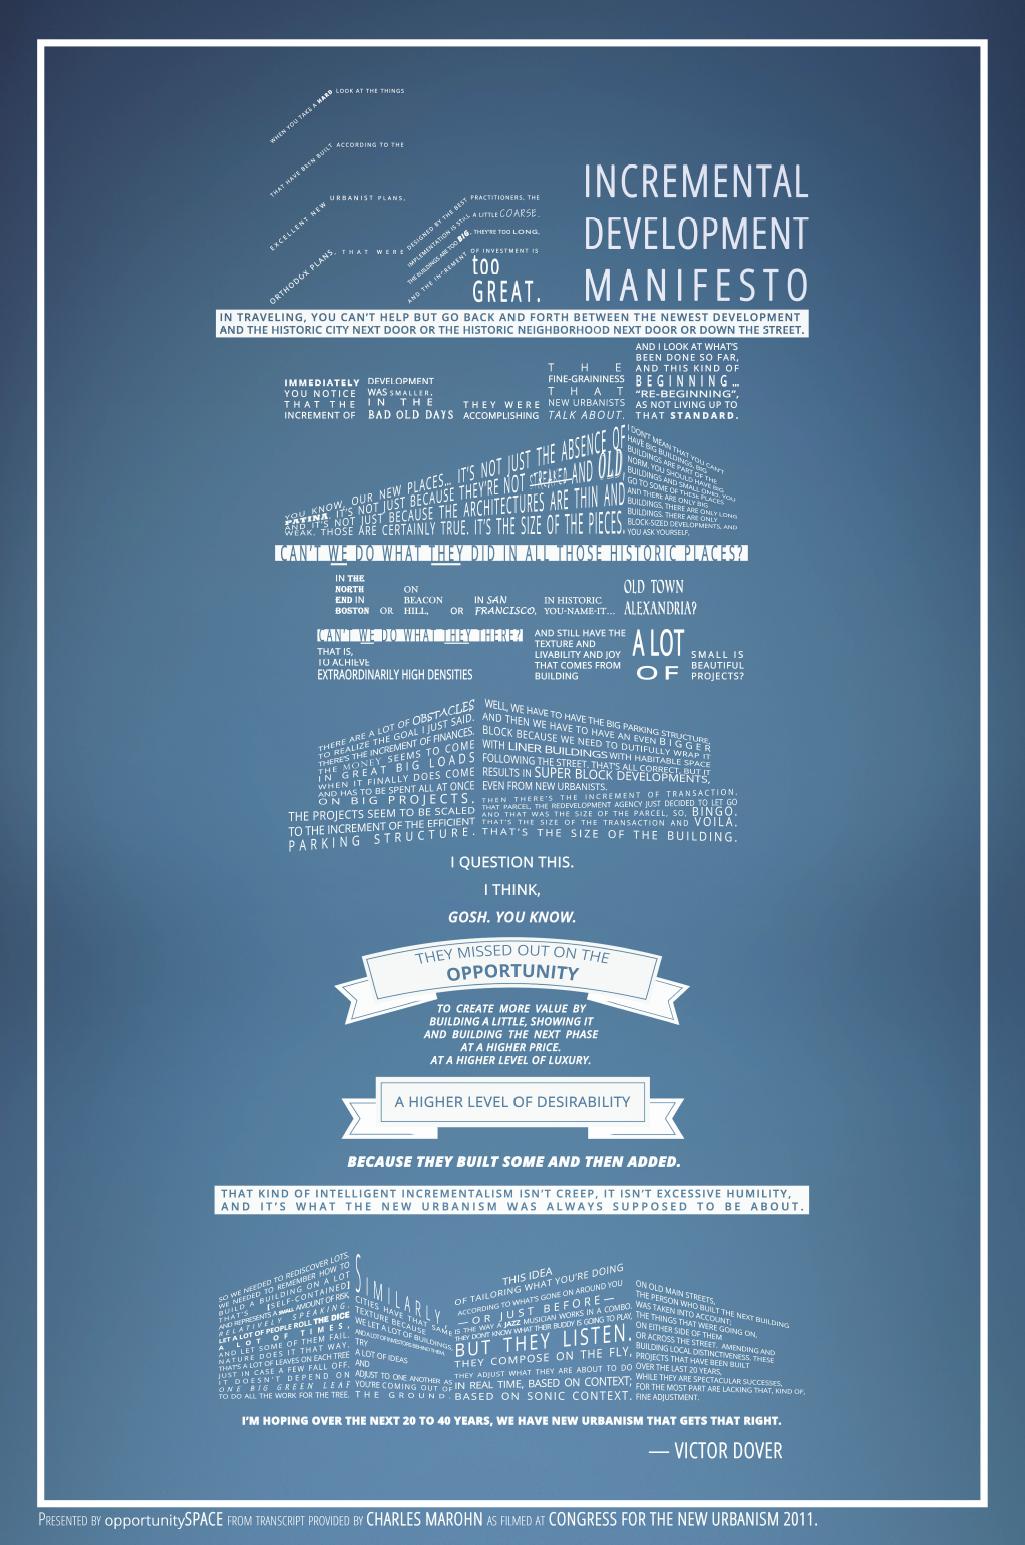 incrementaldevelopmentmanifesto.jpg